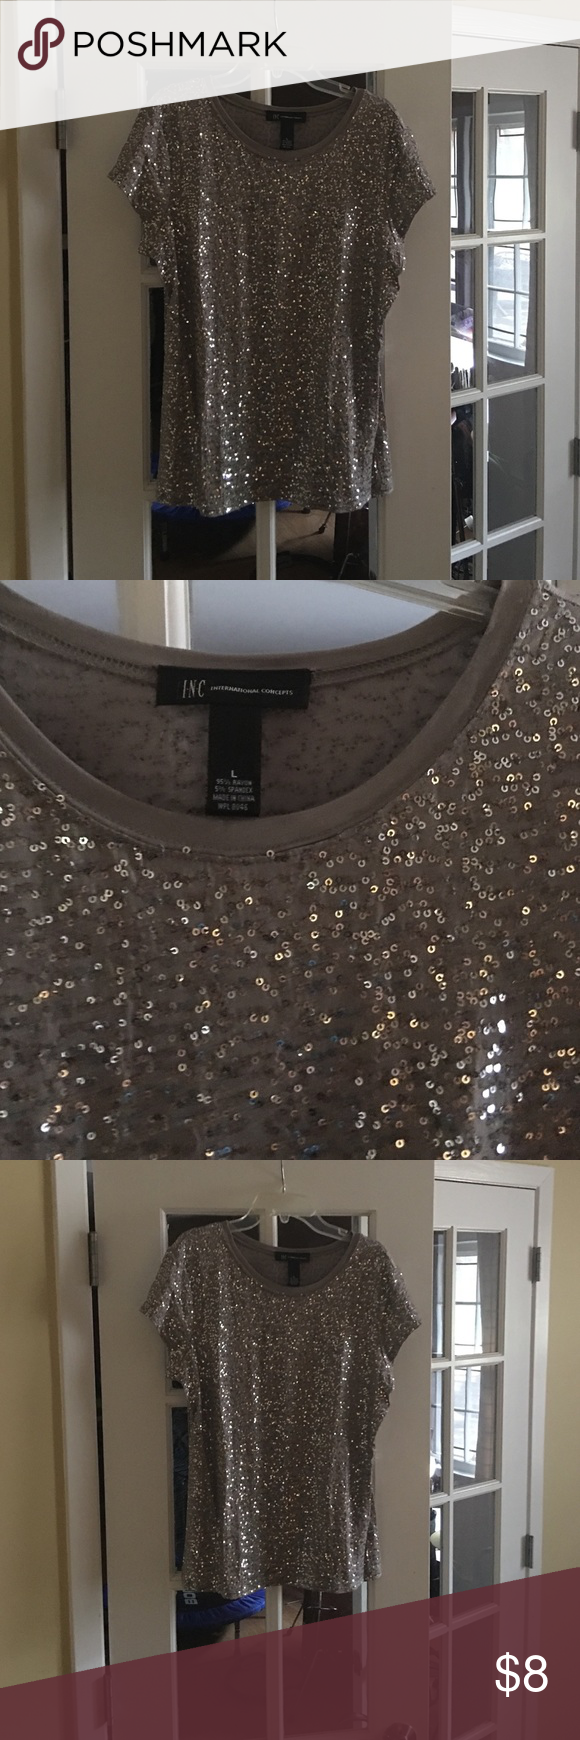 Sequin T-Shirt Worn 1 time - short sleeve silver sequin T-Shirt. INC International Concepts Tops Tees - Short Sleeve